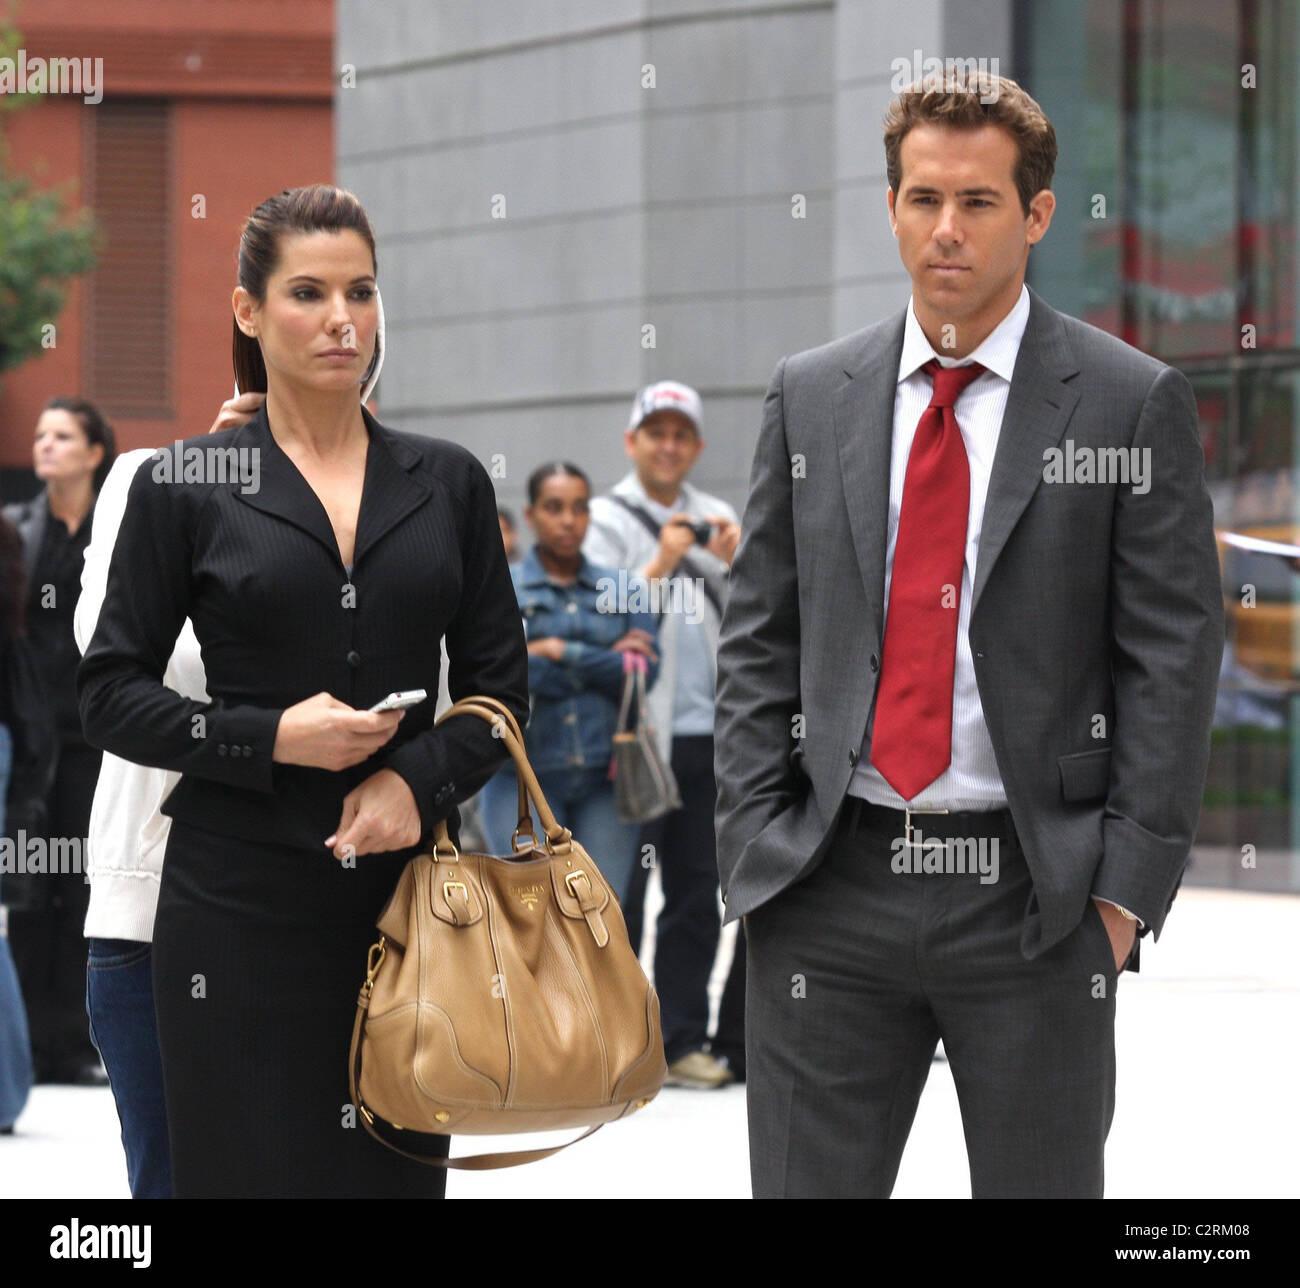 Sandra Bullock And Ryan Reynolds On The Film Set Of 'The